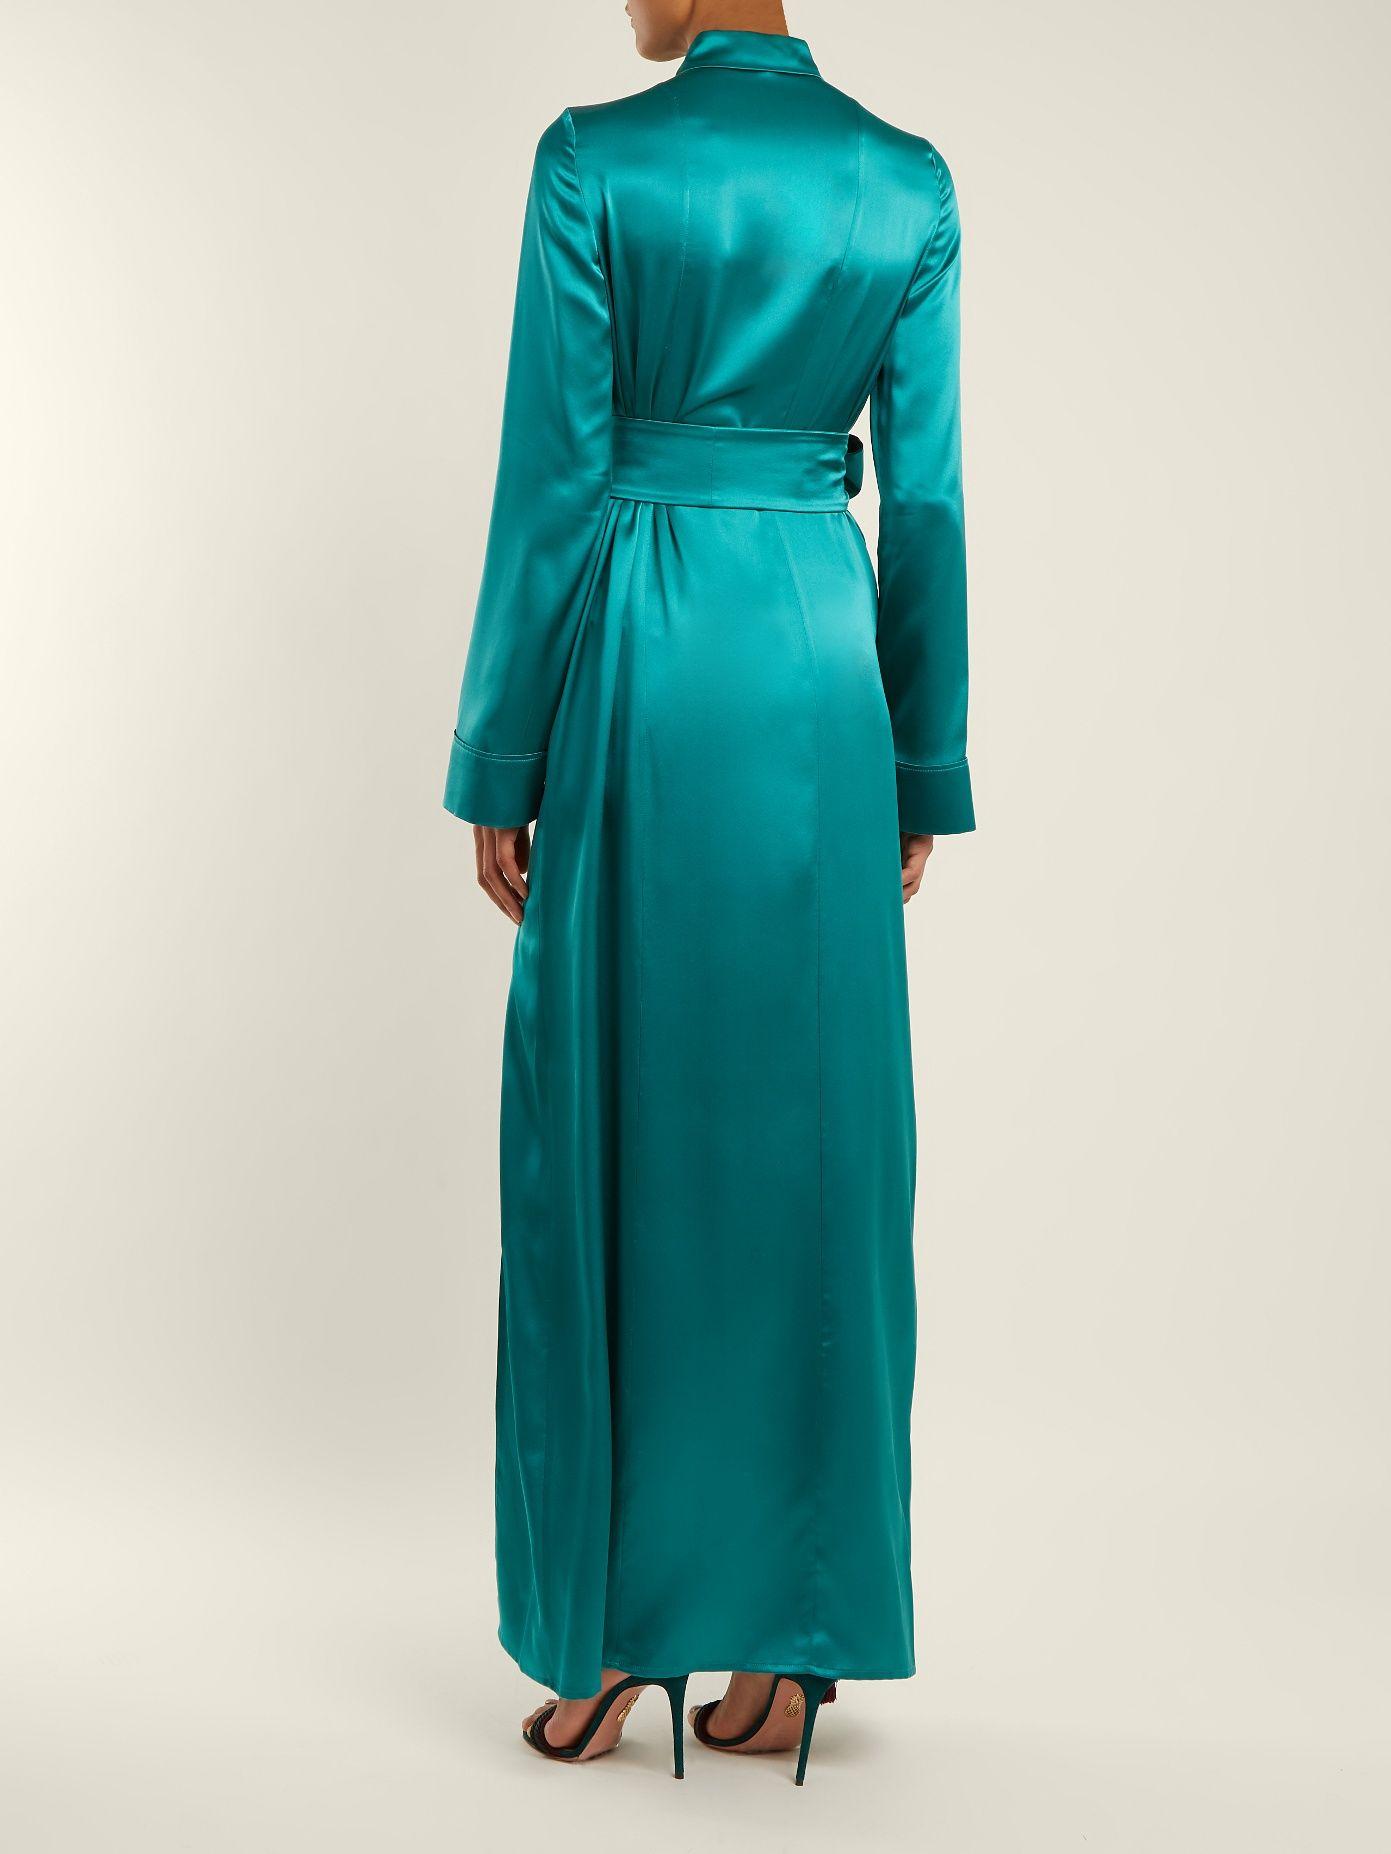 Choice Cheap Online Laguna tie-waist silk-satin dress Galvan Cheap Sale Shop For Free Shipping New Styles Fake Sale Online How Much X6cmTt